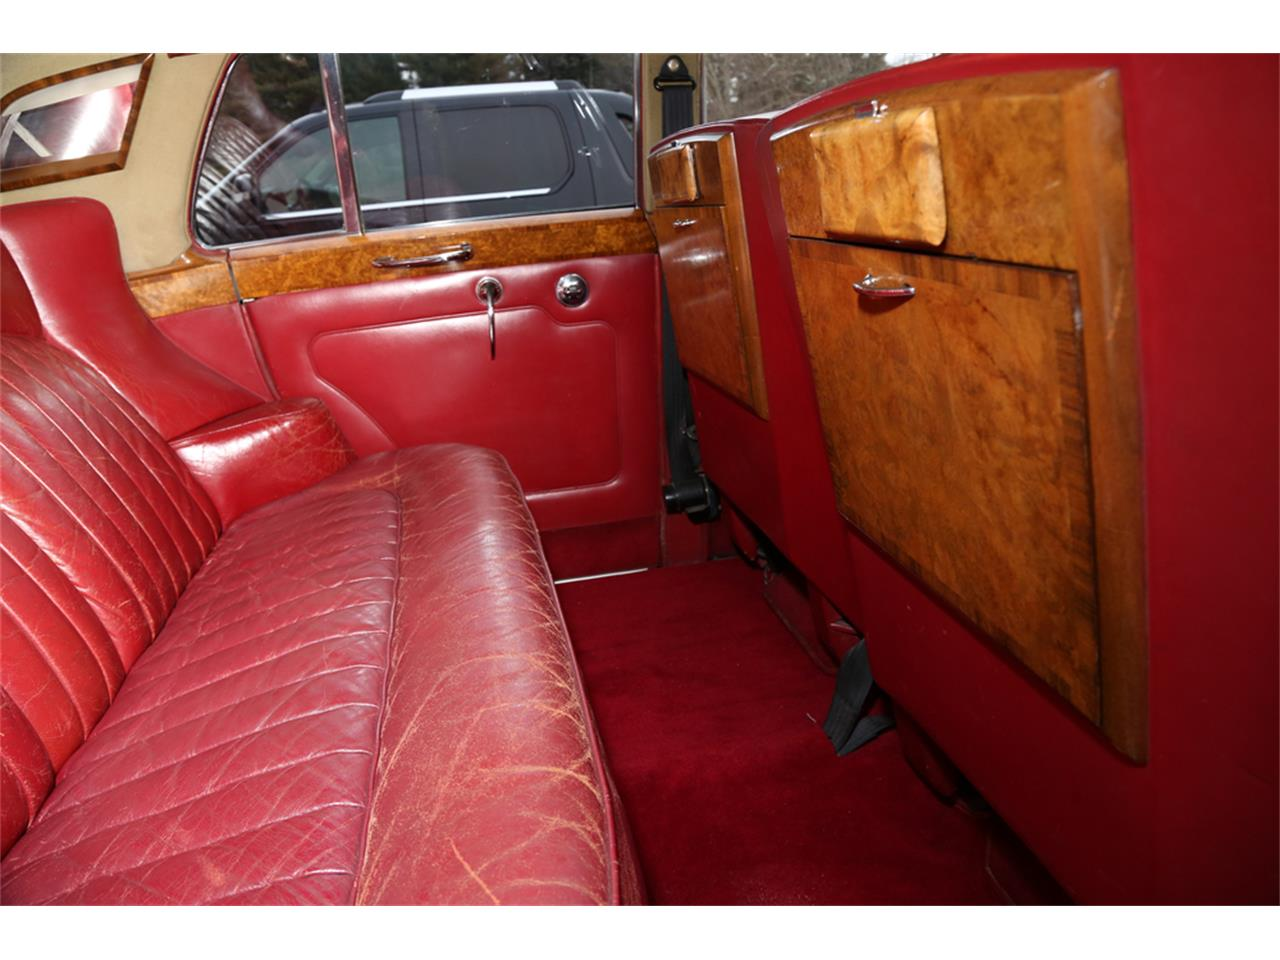 1963 Bentley S3 (CC-1231150) for sale in Uncasville, Connecticut